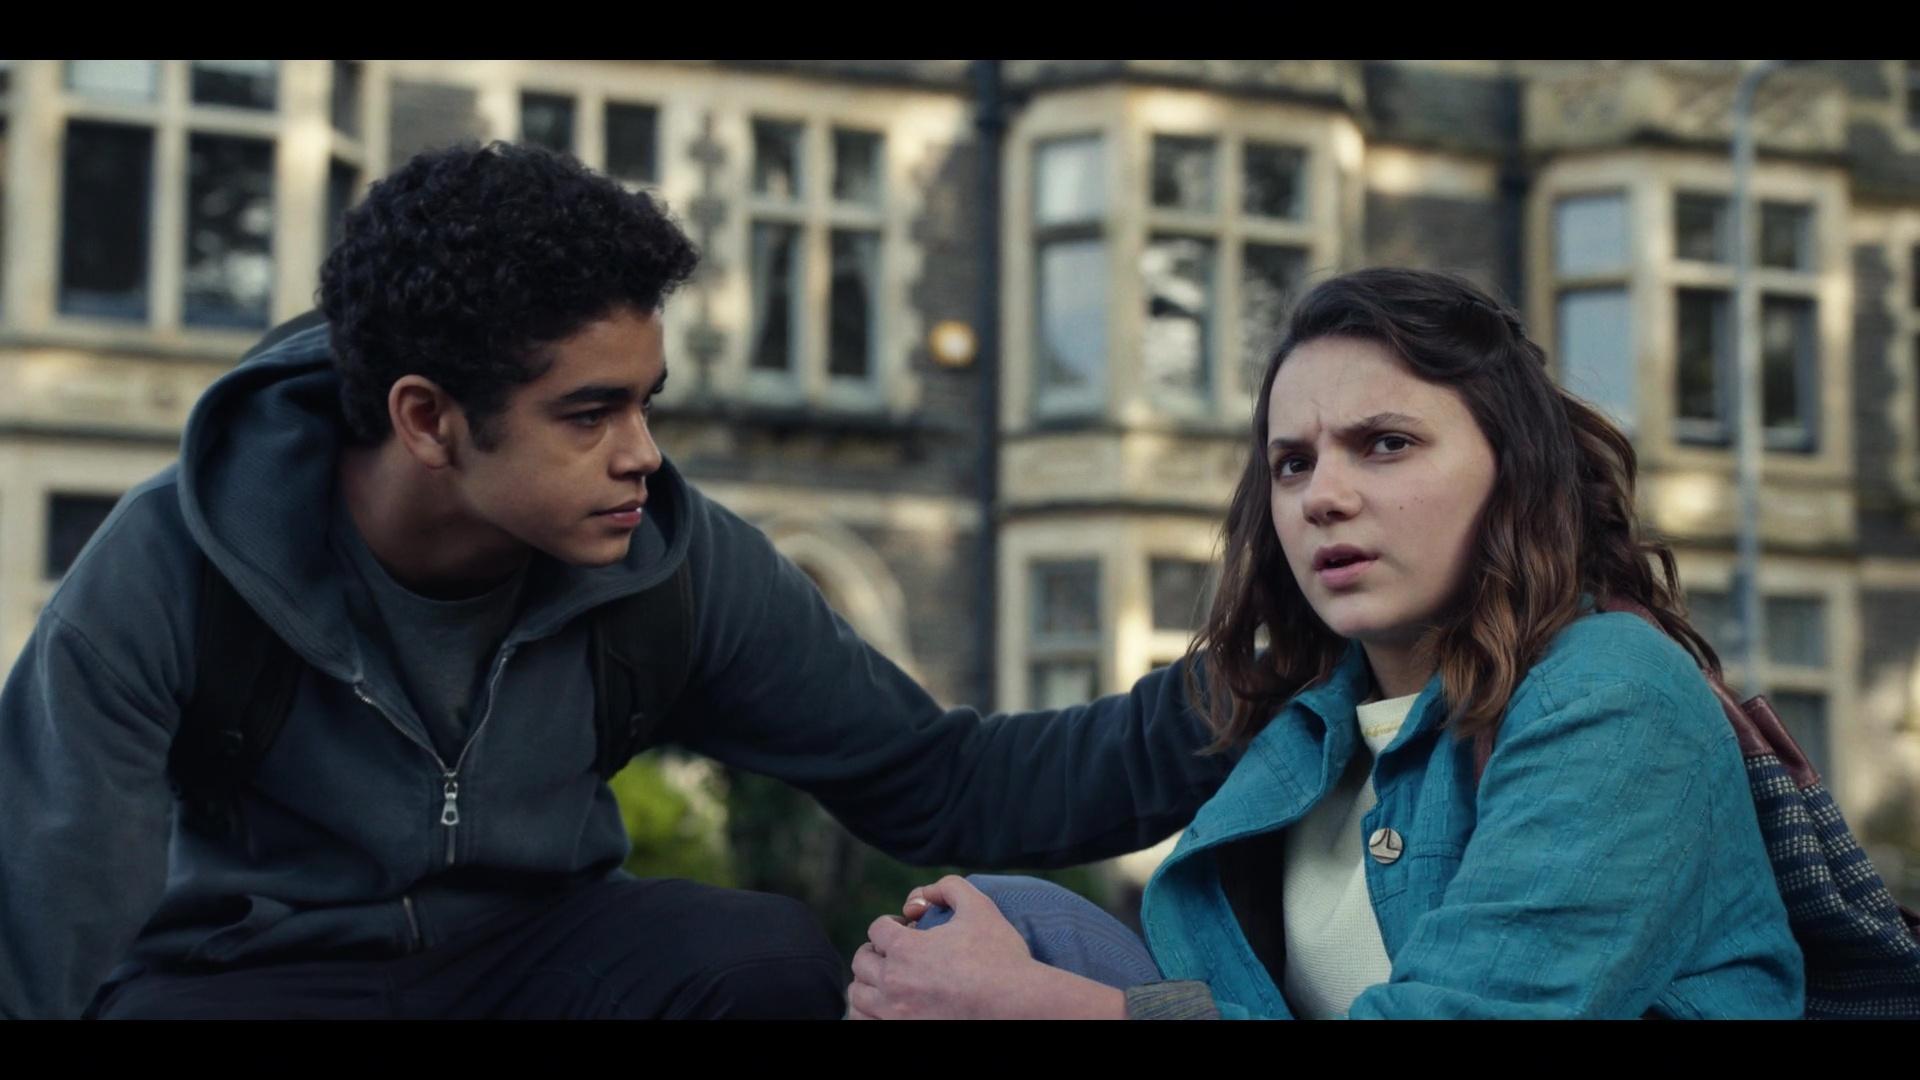 La materia oscura (2020) Temporada 2 1080p WEB-DL Latino